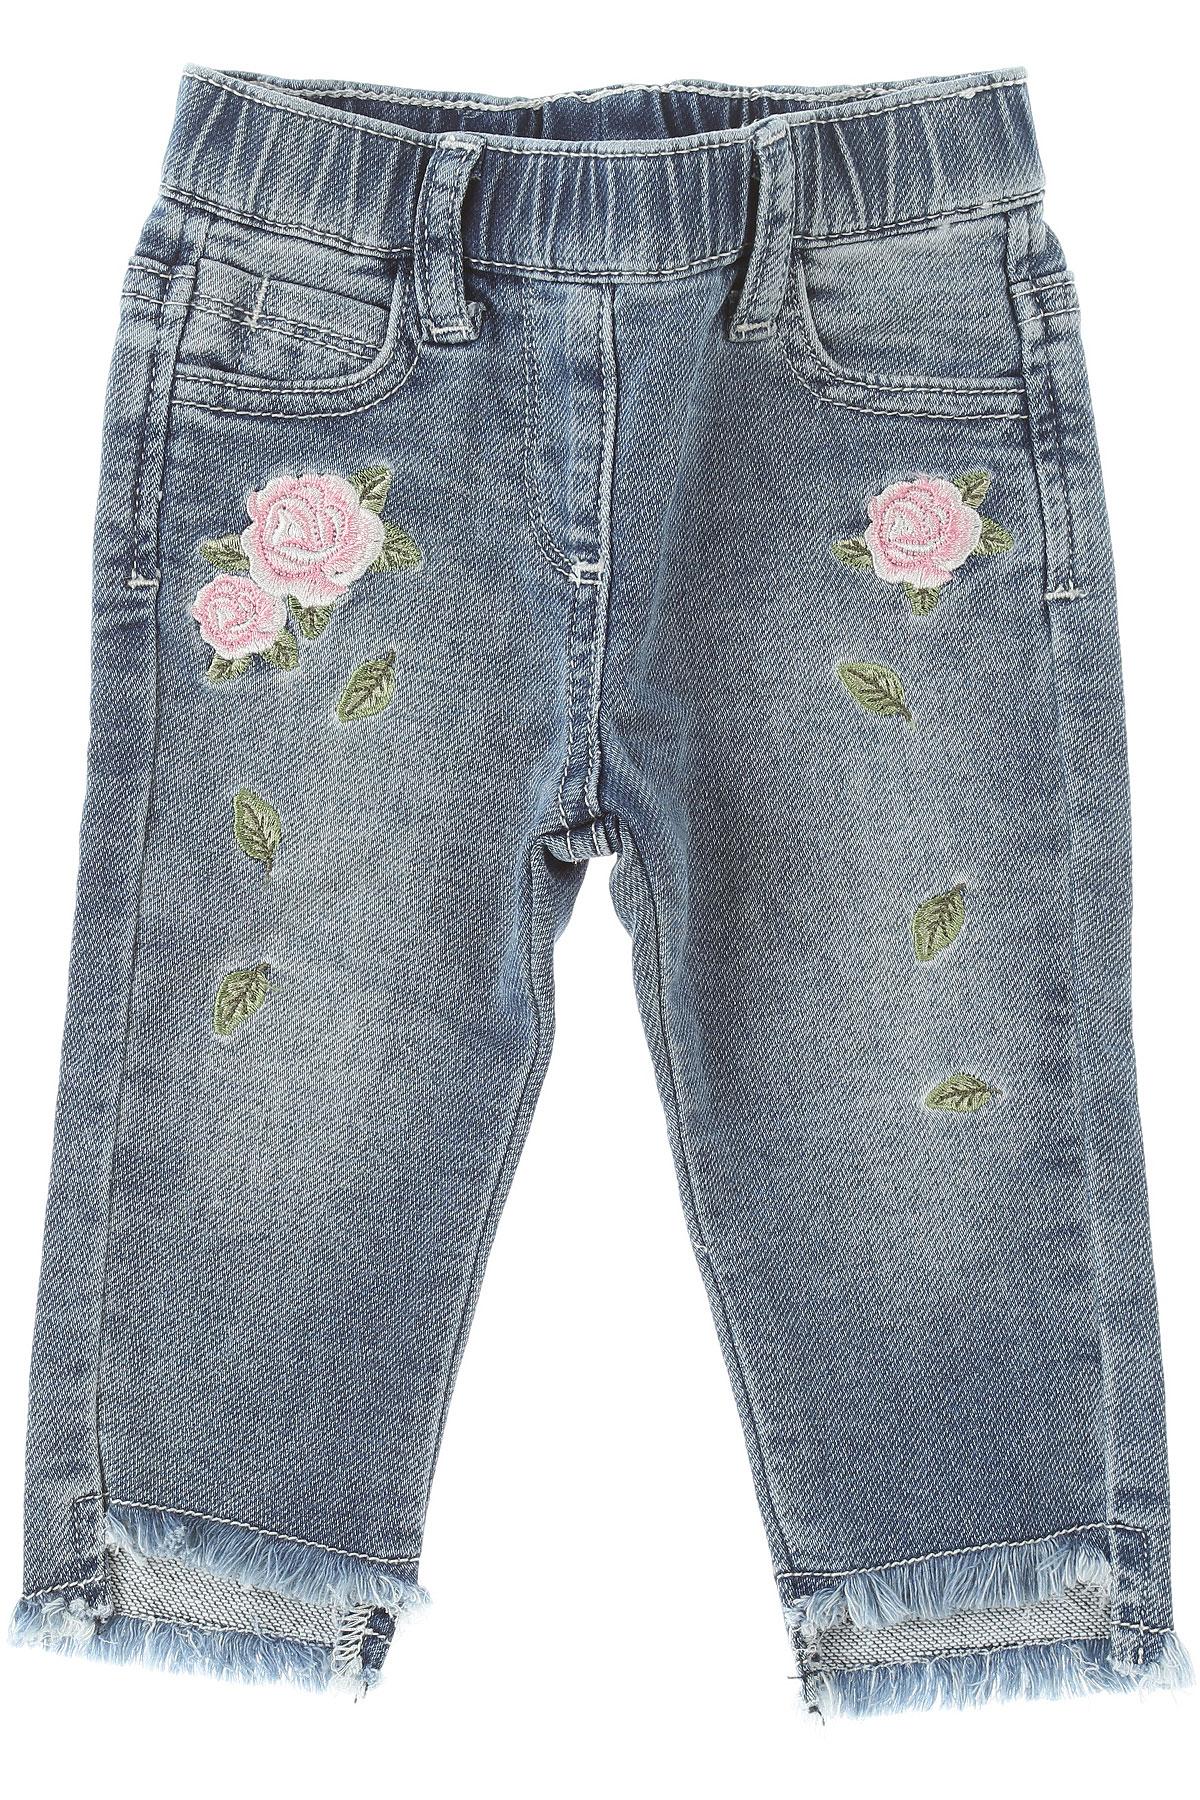 Monnalisa Baby Jeans for Girls On Sale, Blue Denim, Cotton, 2019, 12M 12M 18M 24M 2Y 3Y 9M